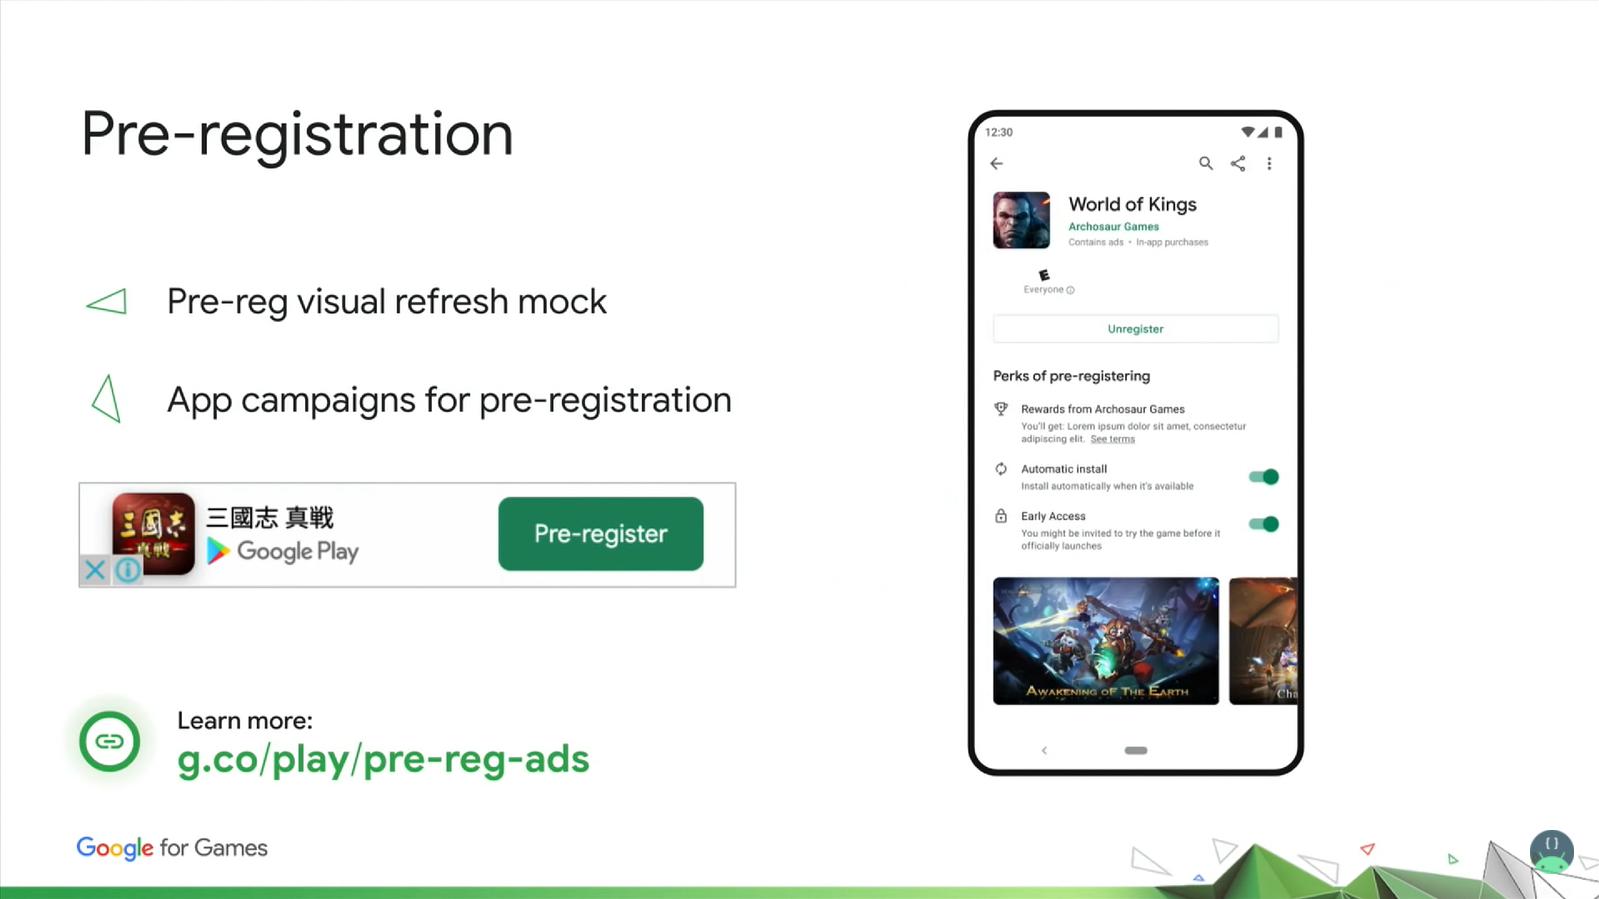 Pre-registration in Google Play